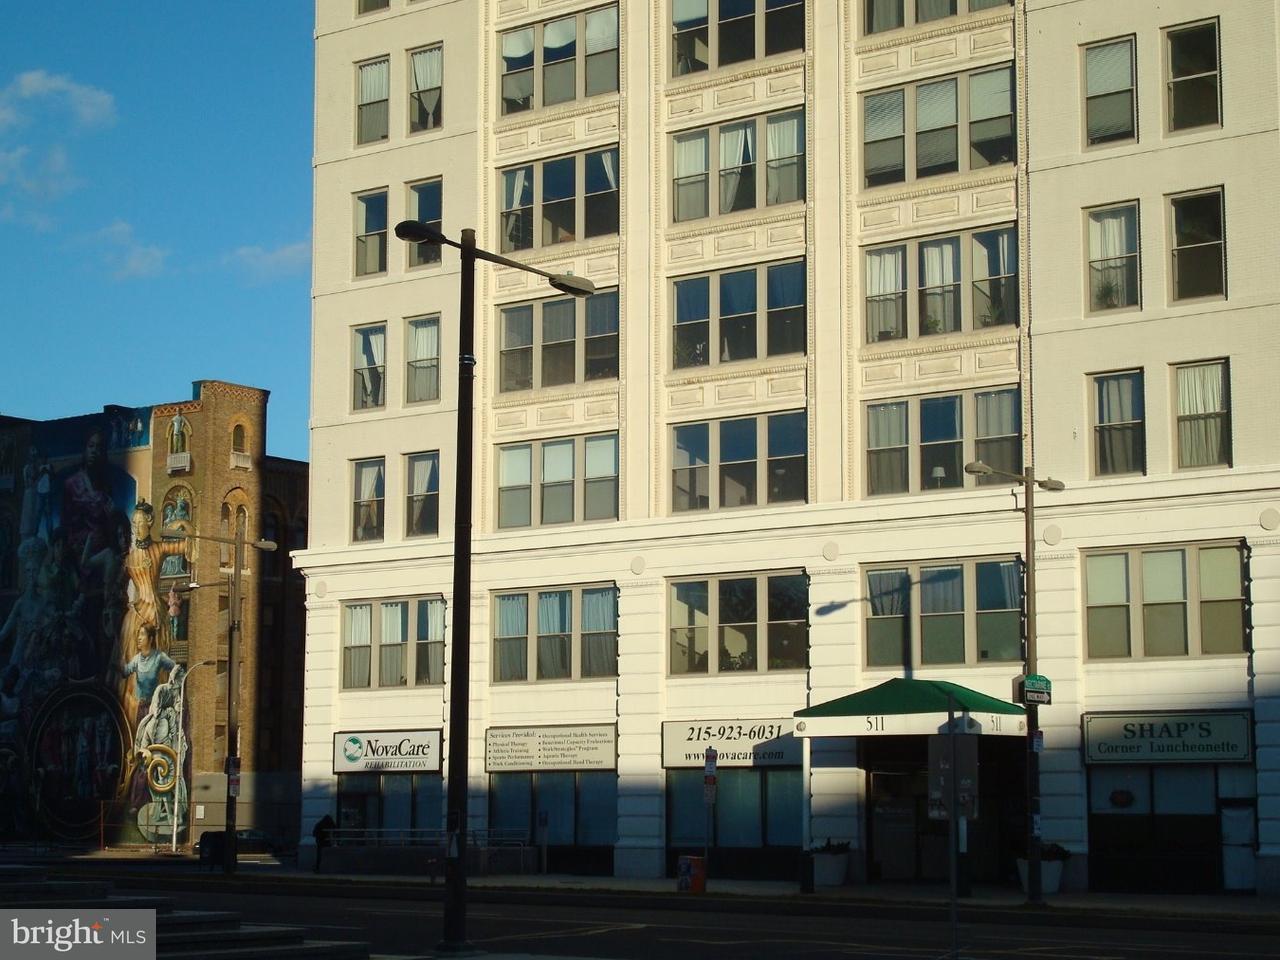 511 N Broad Philadelphia, PA 19123